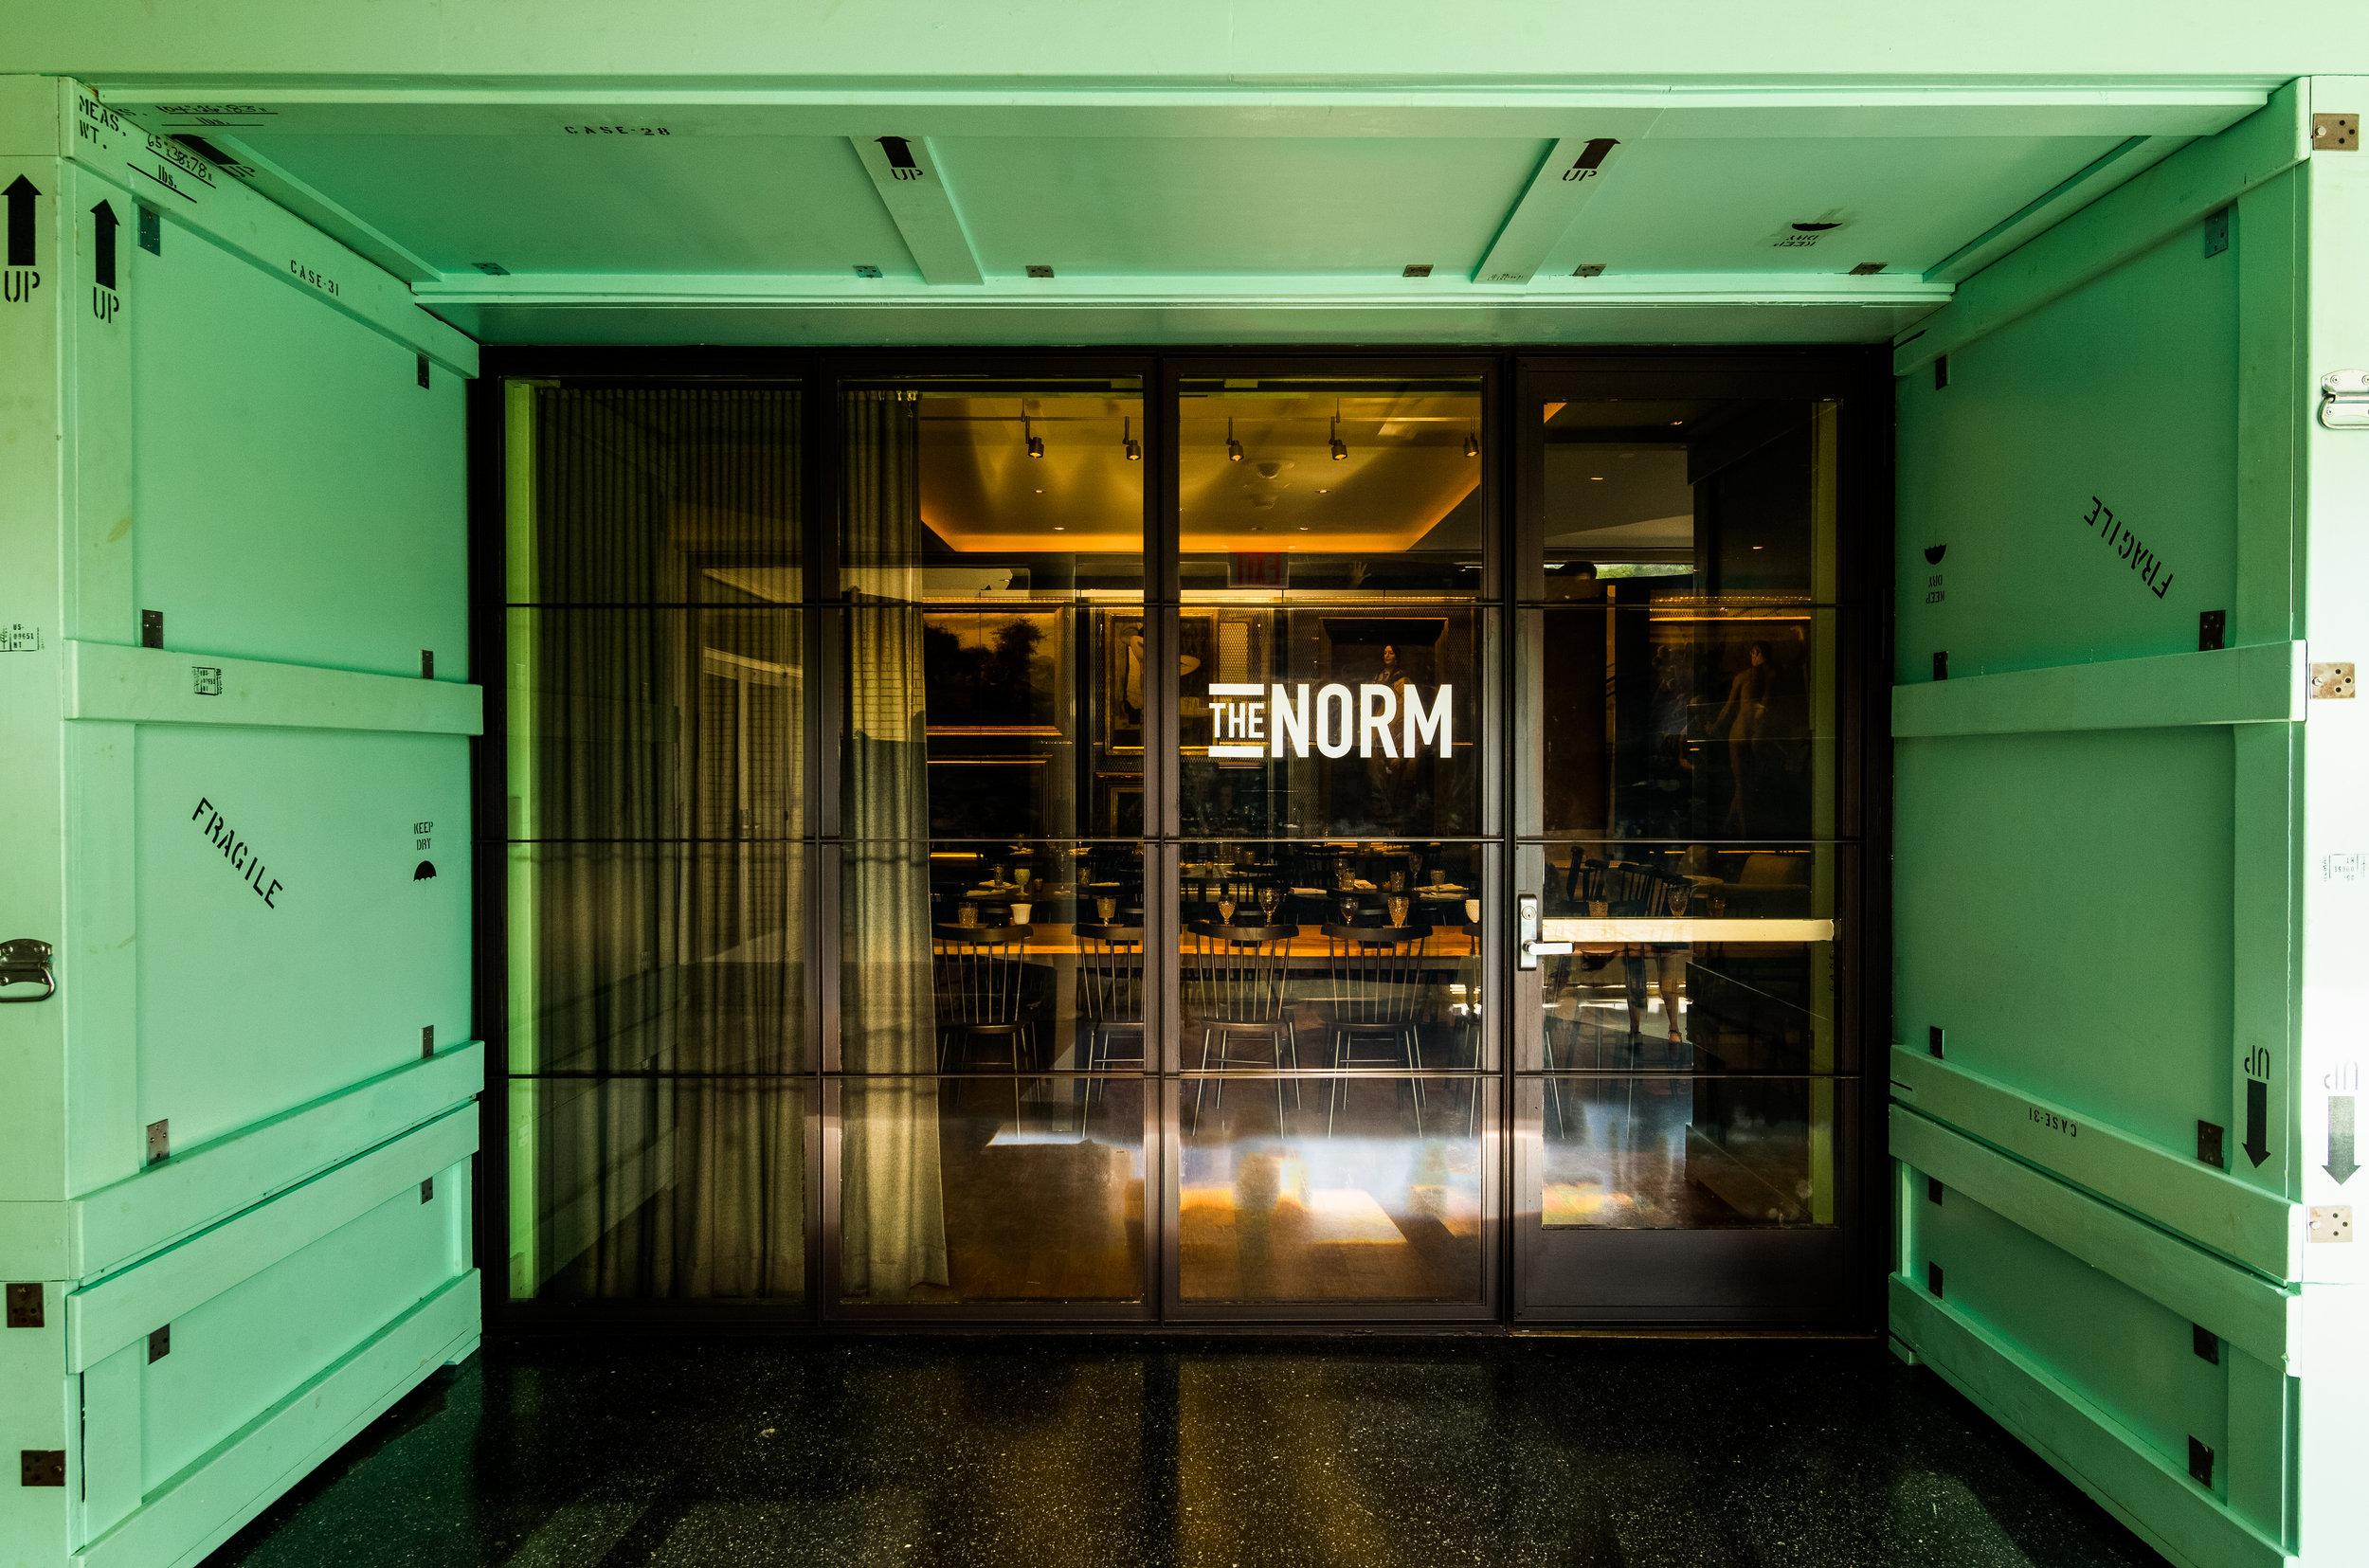 the_norm_entrance-1.jpg